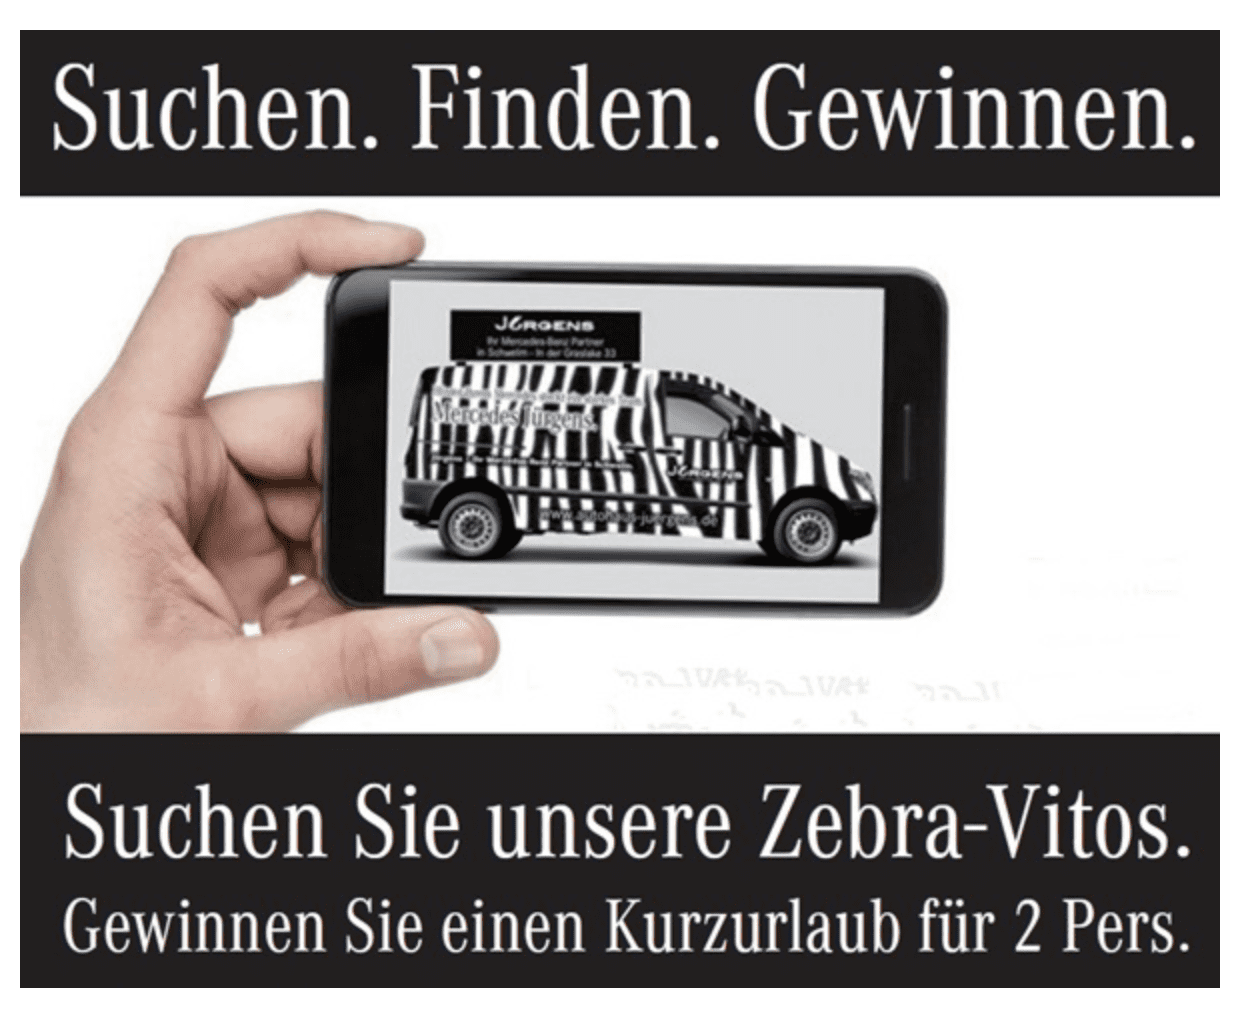 Autohaus Jürgens Gewinnspiel-Cases Automotive